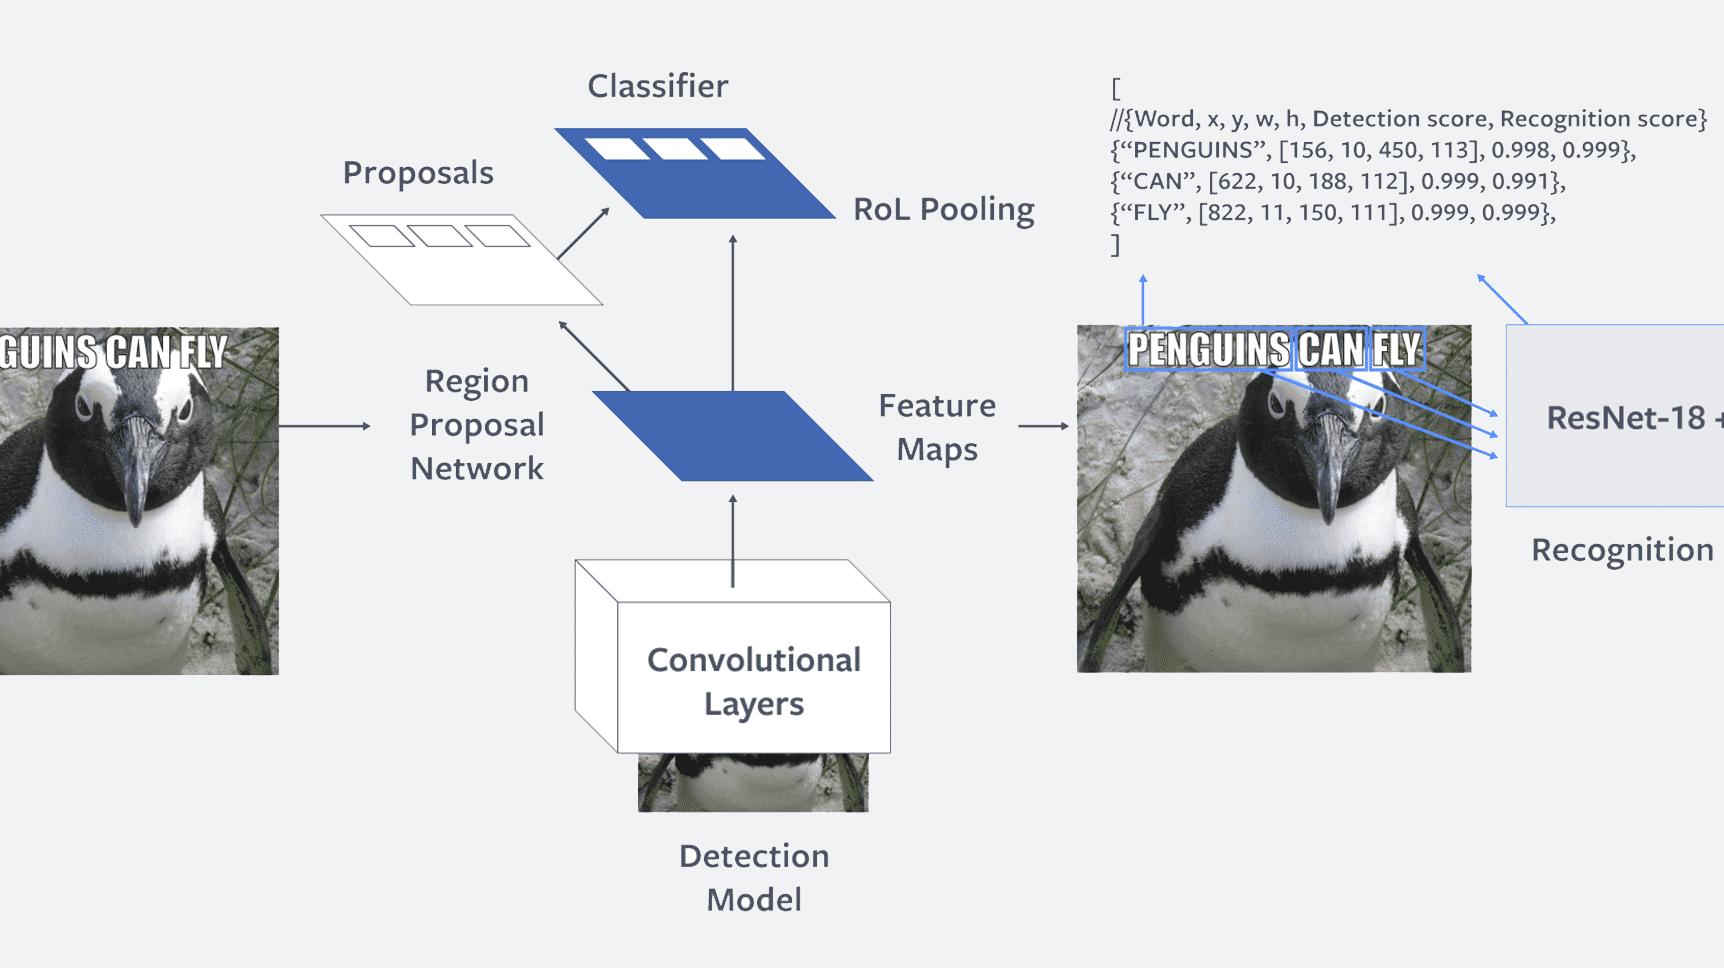 Facebook: Neuronales Netzwerk Rosetta kann Texte in Bildern automatisch erkennen